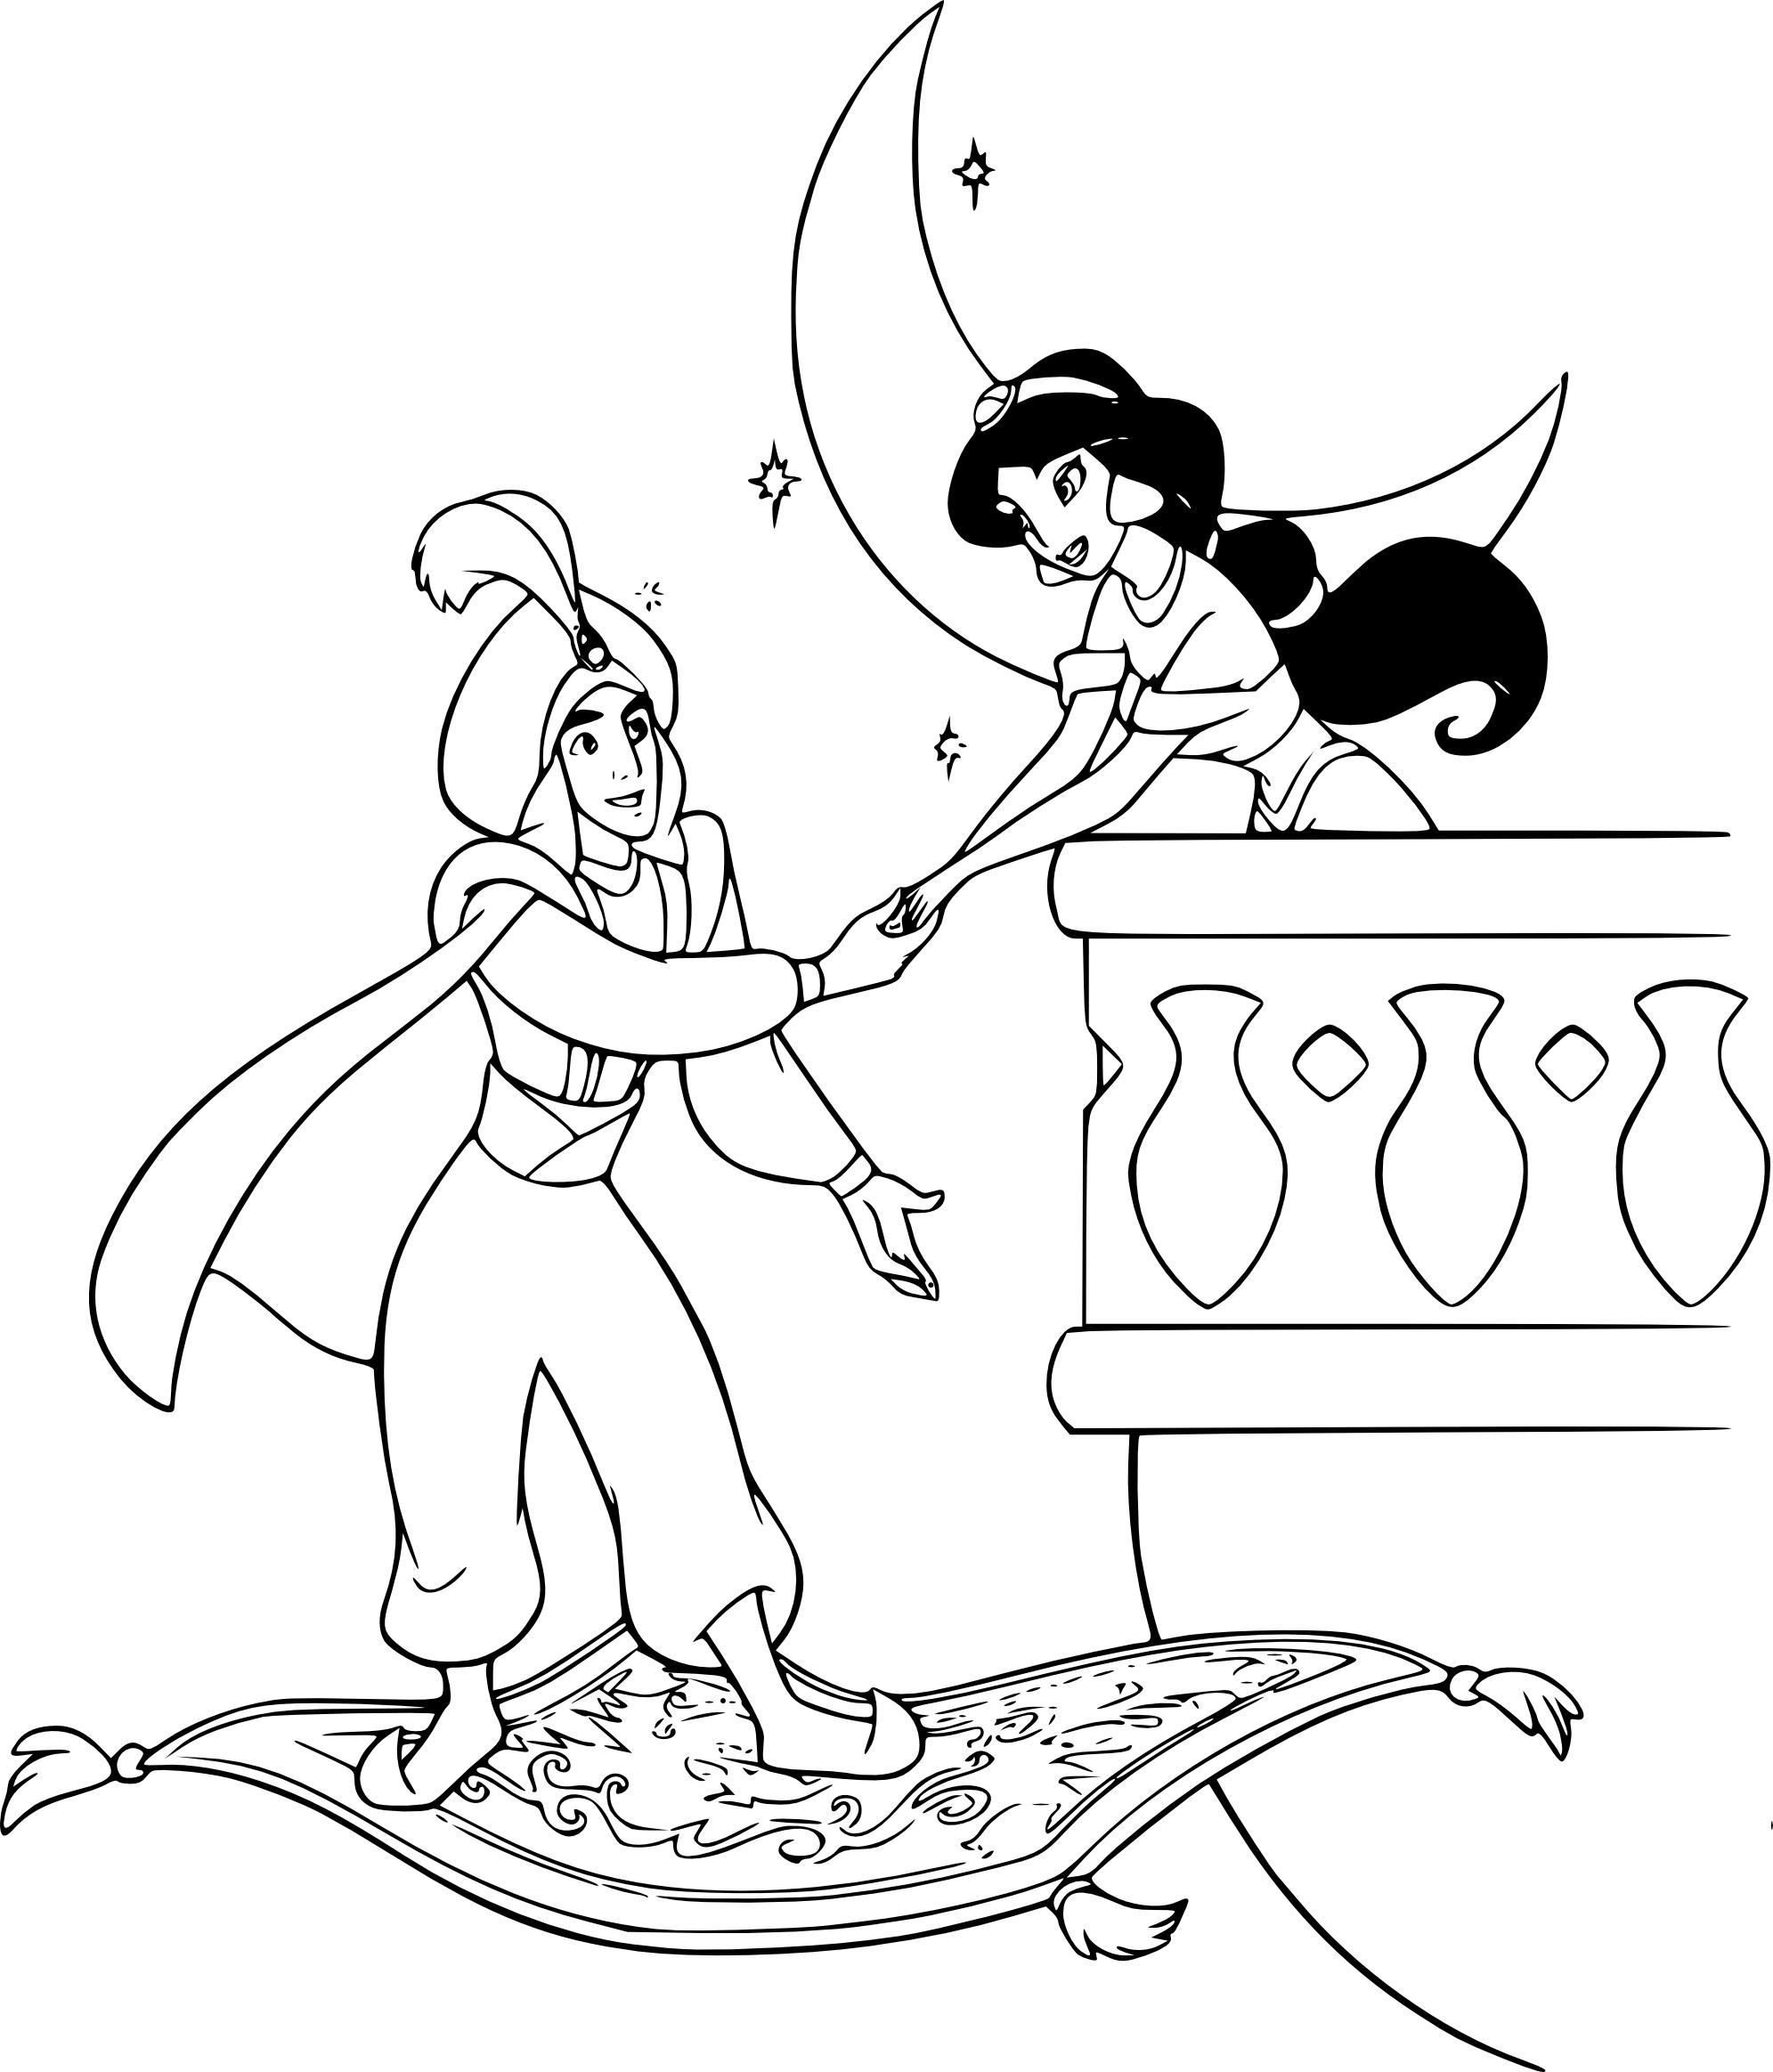 Unique dessin a imprimer disney aladdin - Dessin a imprimer aladin ...